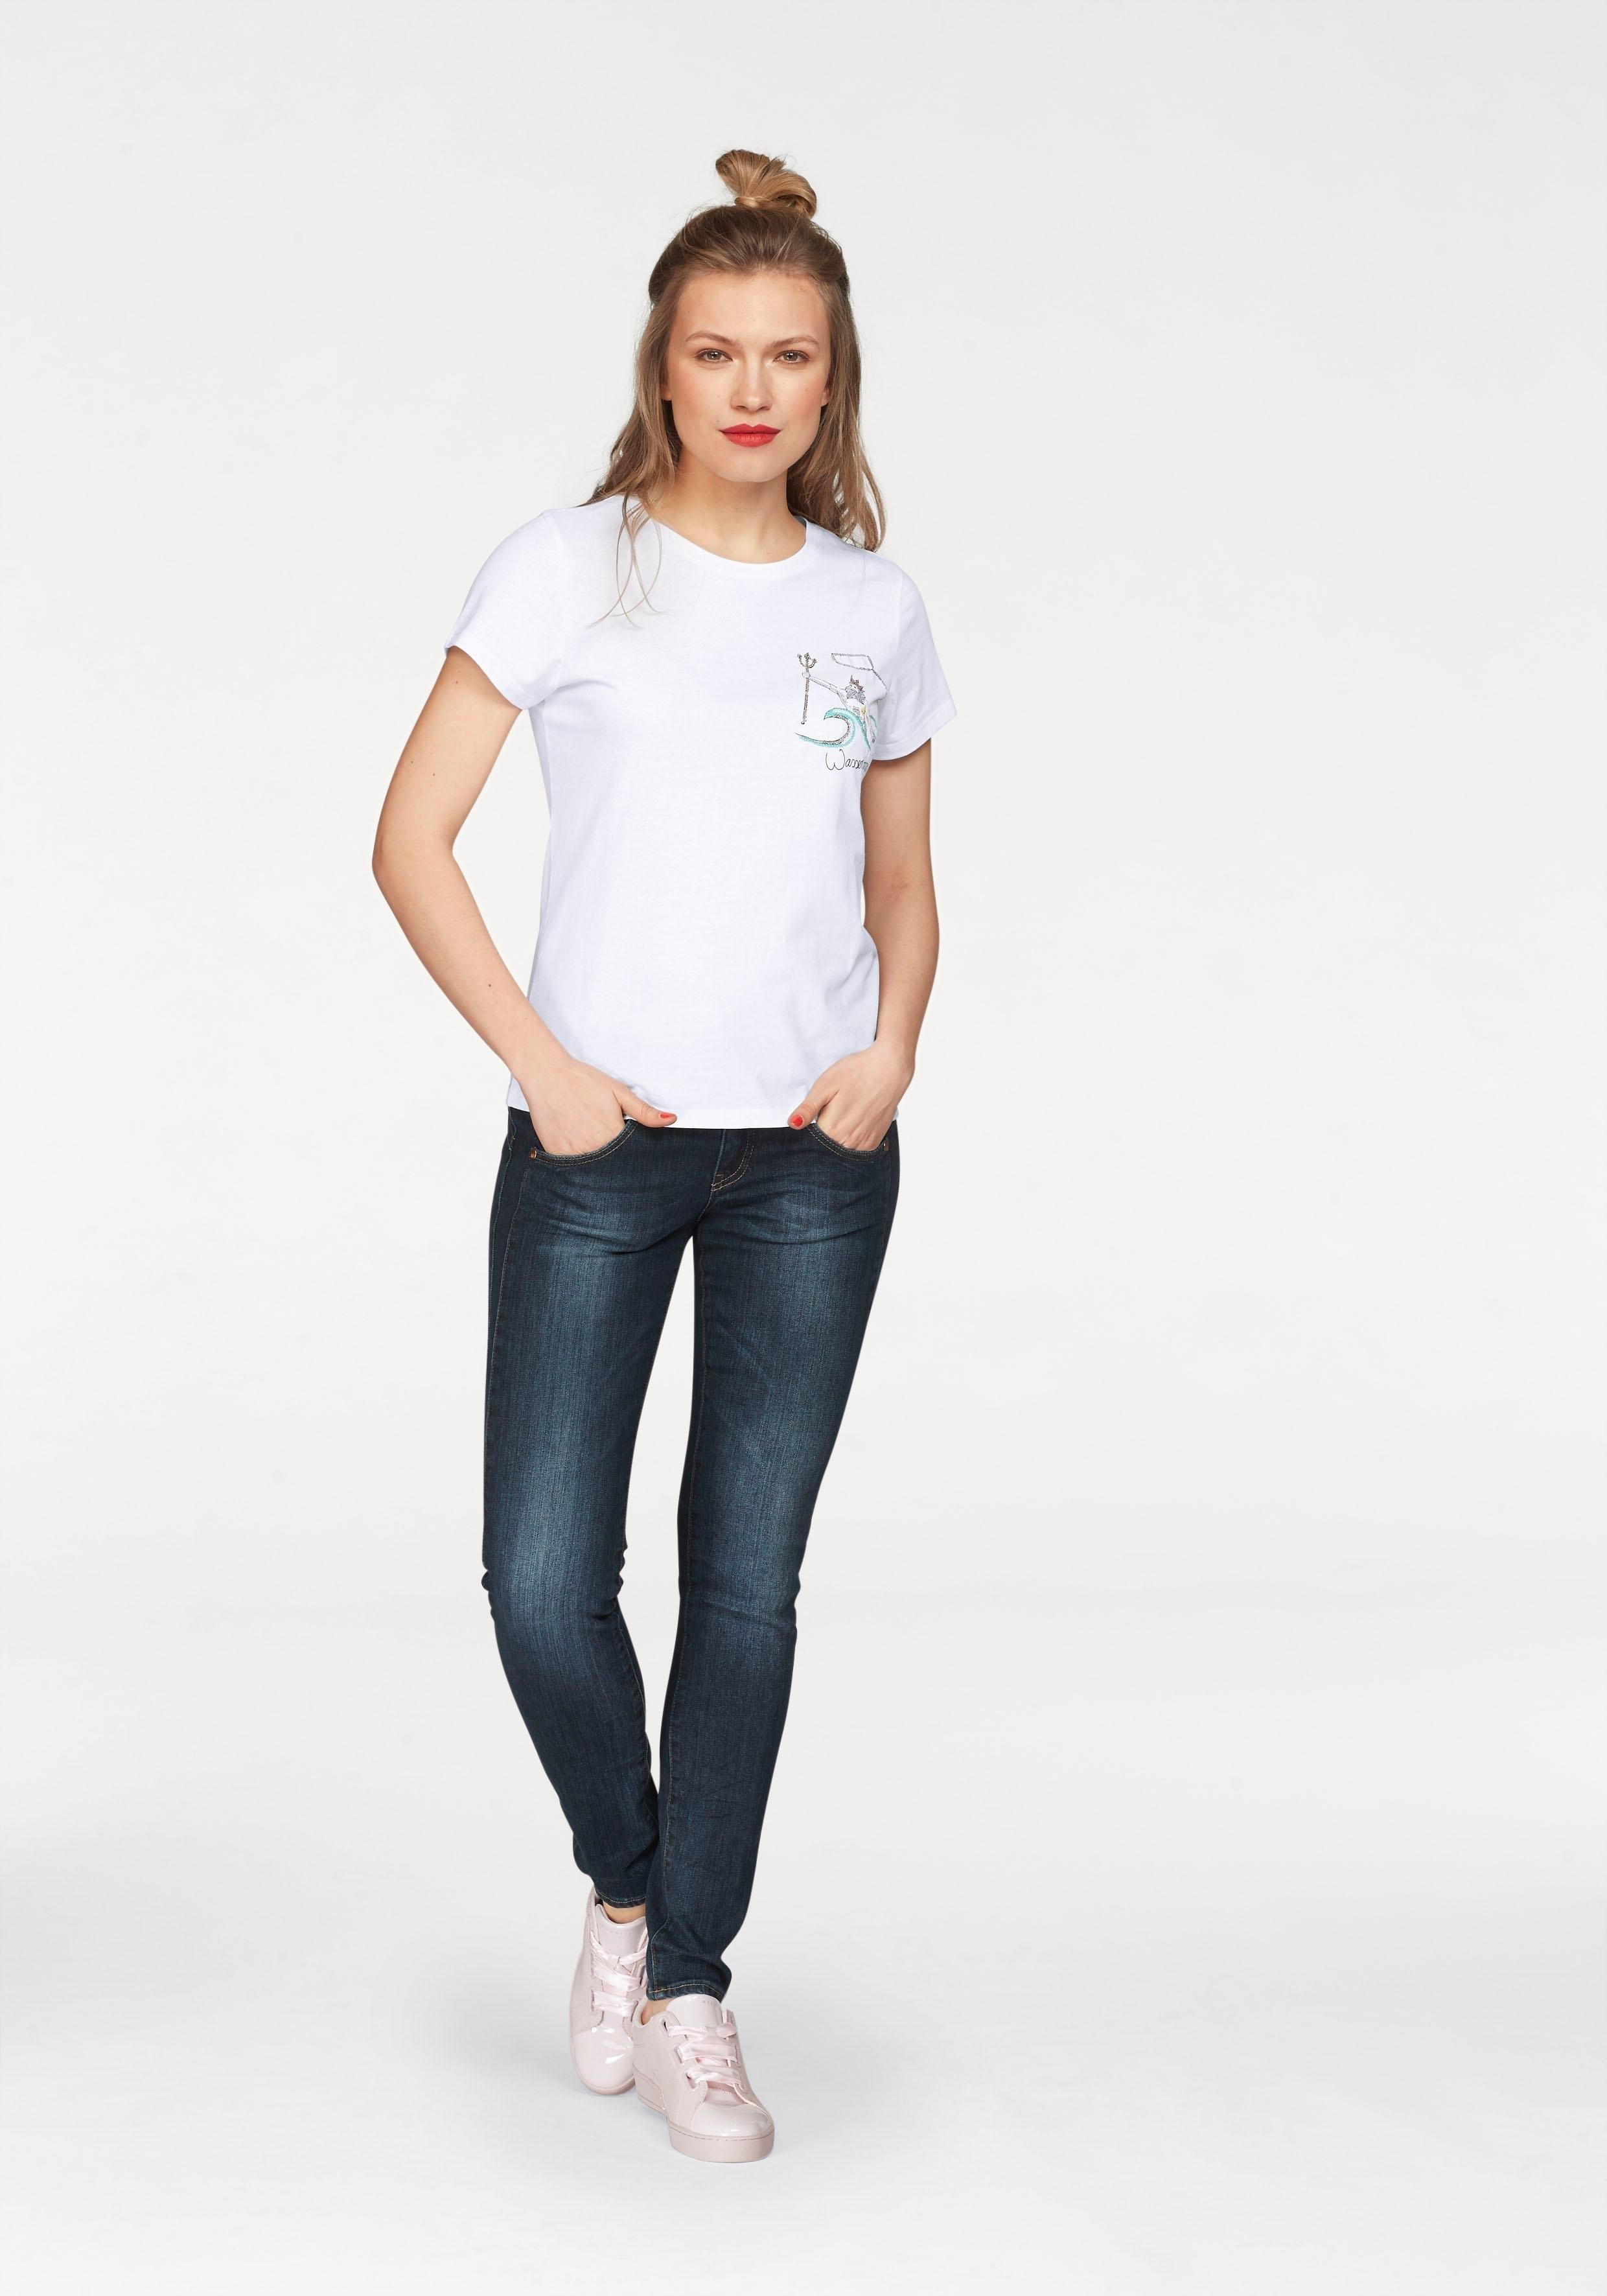 Fit Gevonden Slim Herrlicher Makkelijk jeansgila wP8nN0OXk